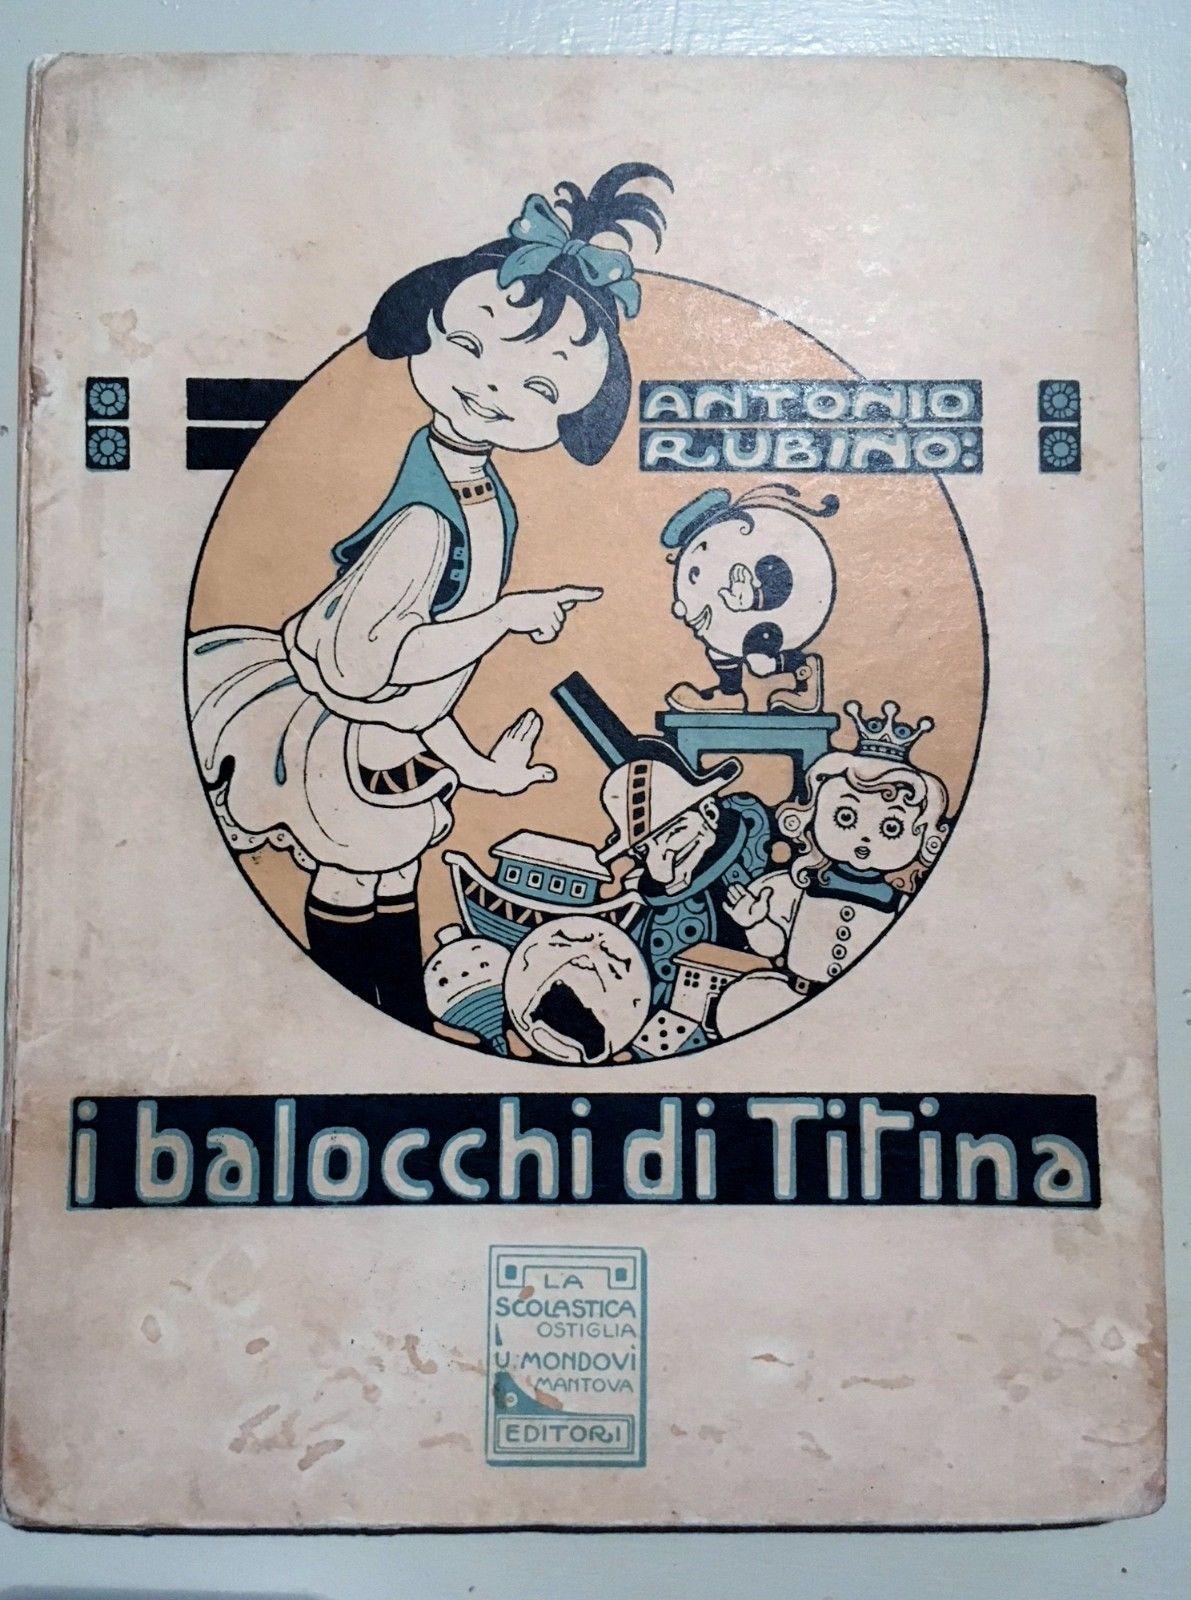 Rubino: I balocchi di Titina, 1912